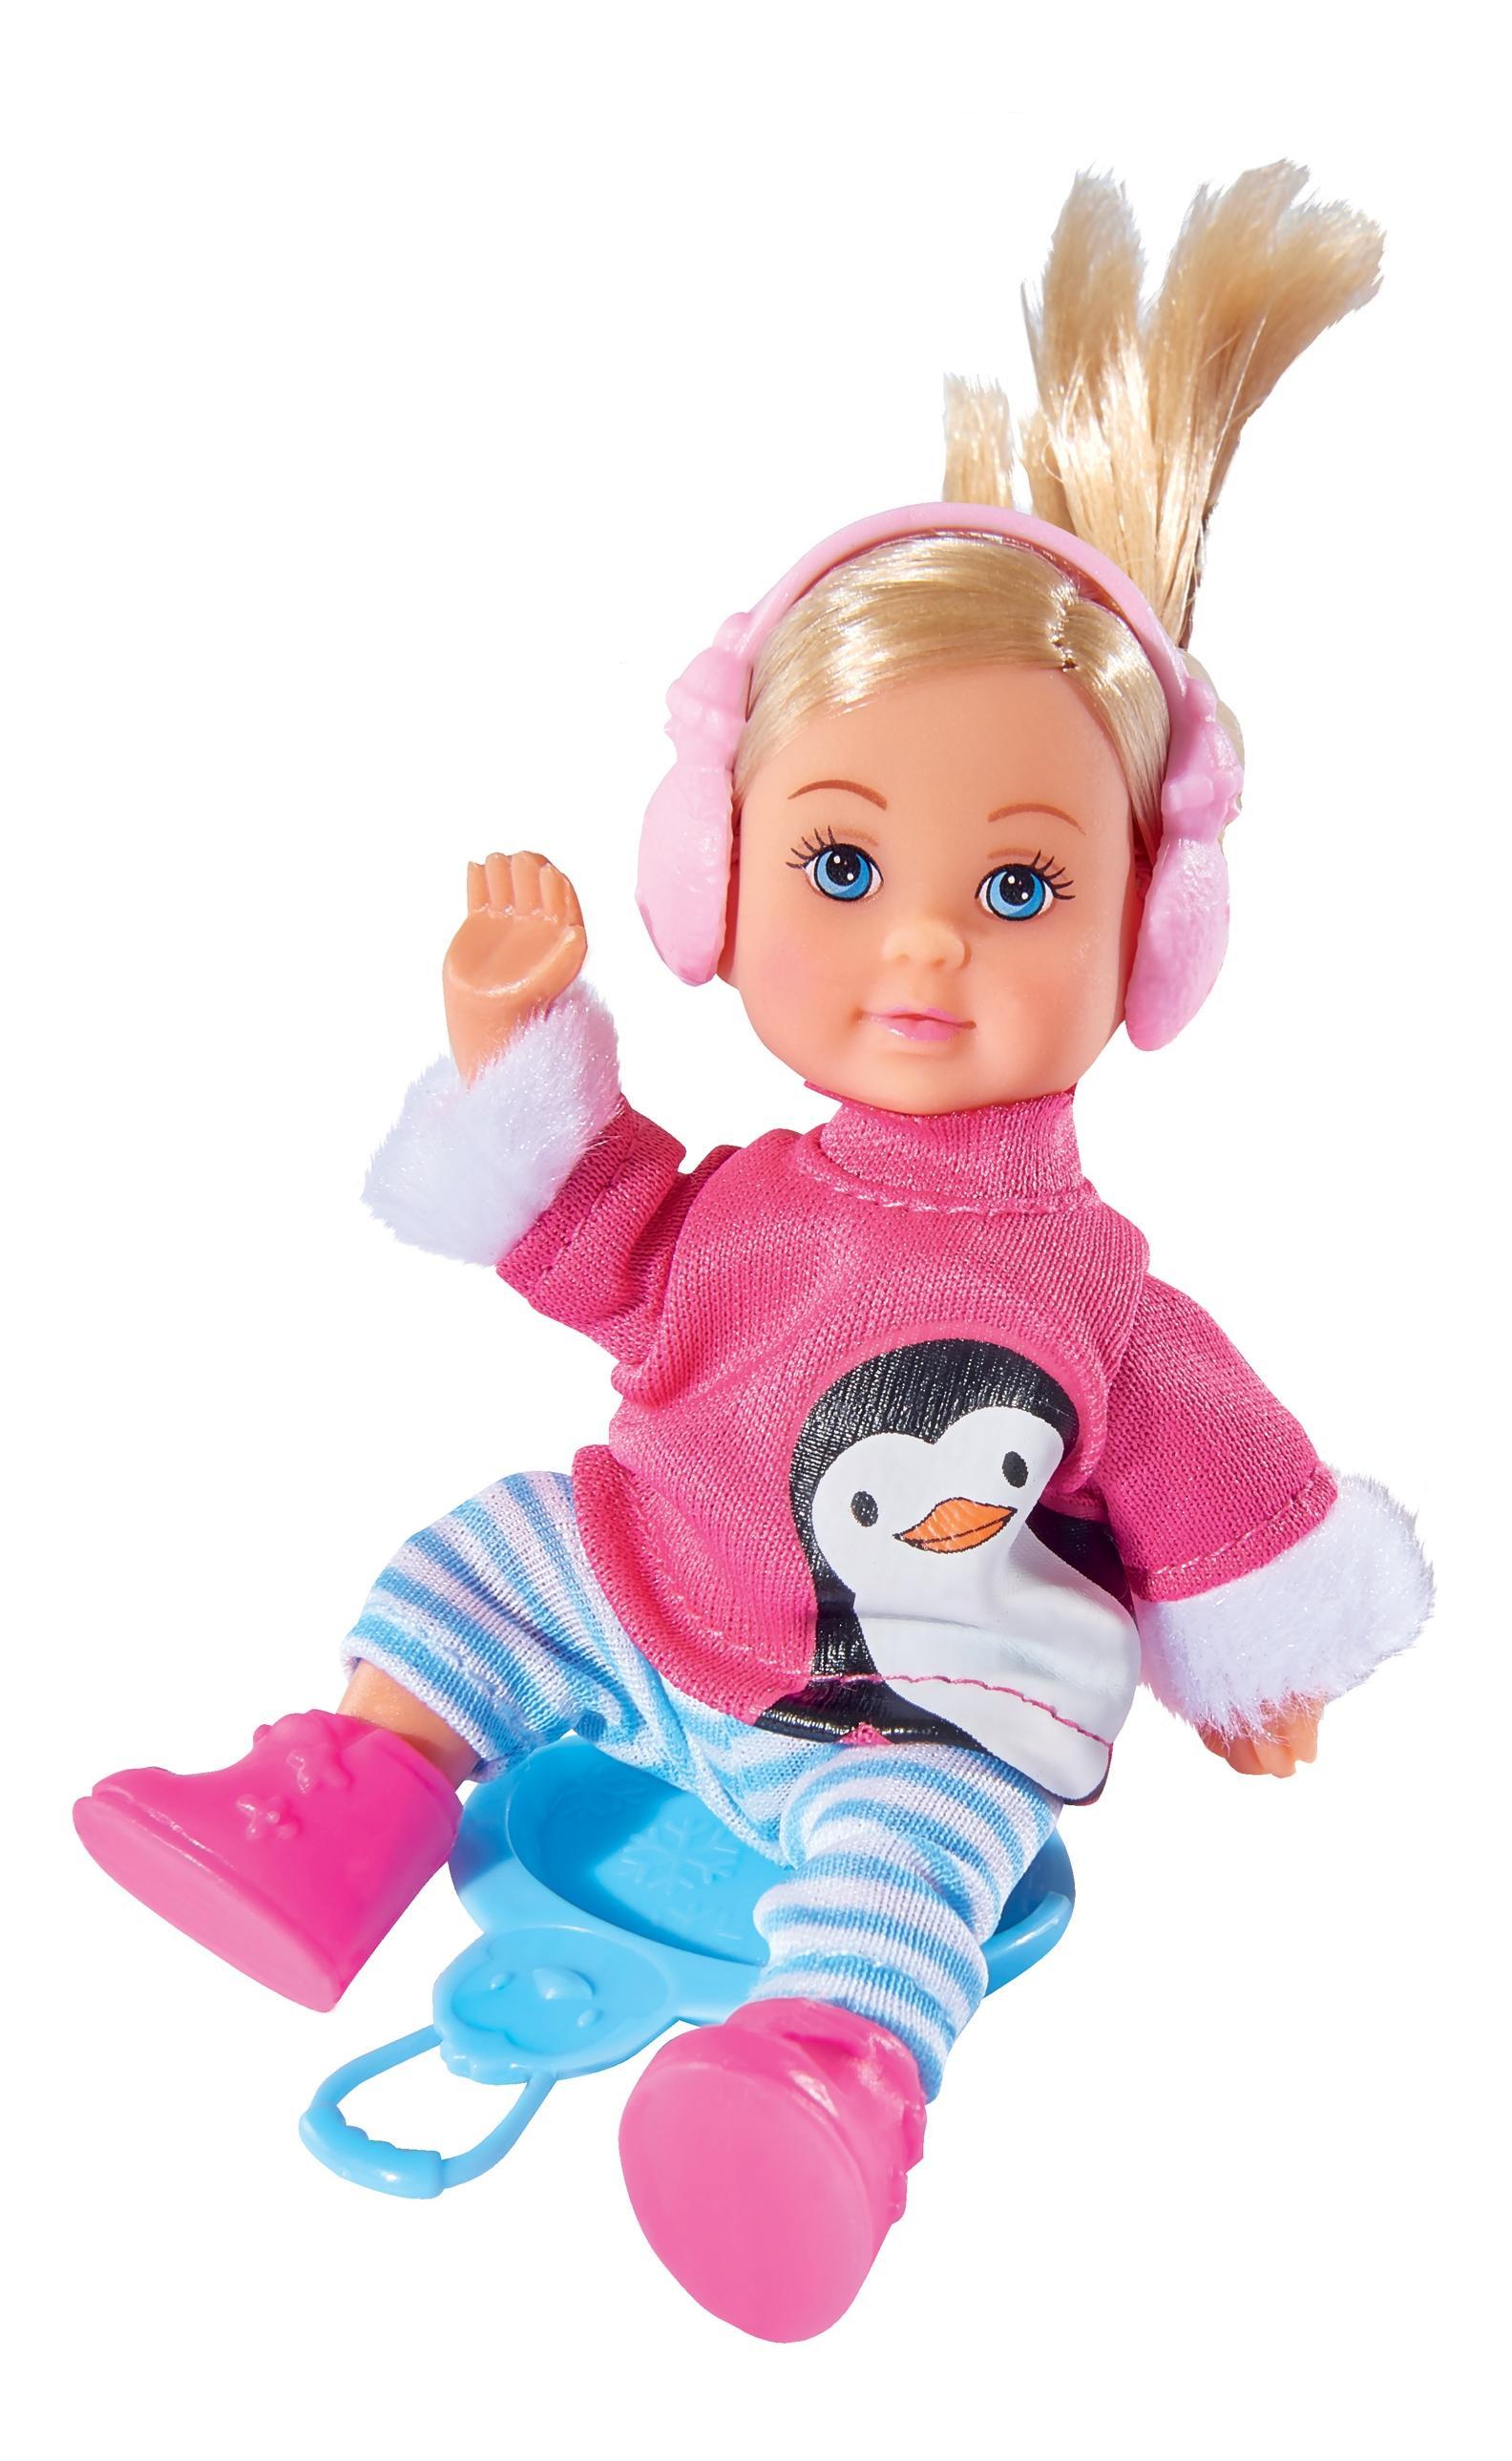 Кукла Simba Еви в зимнем костюме